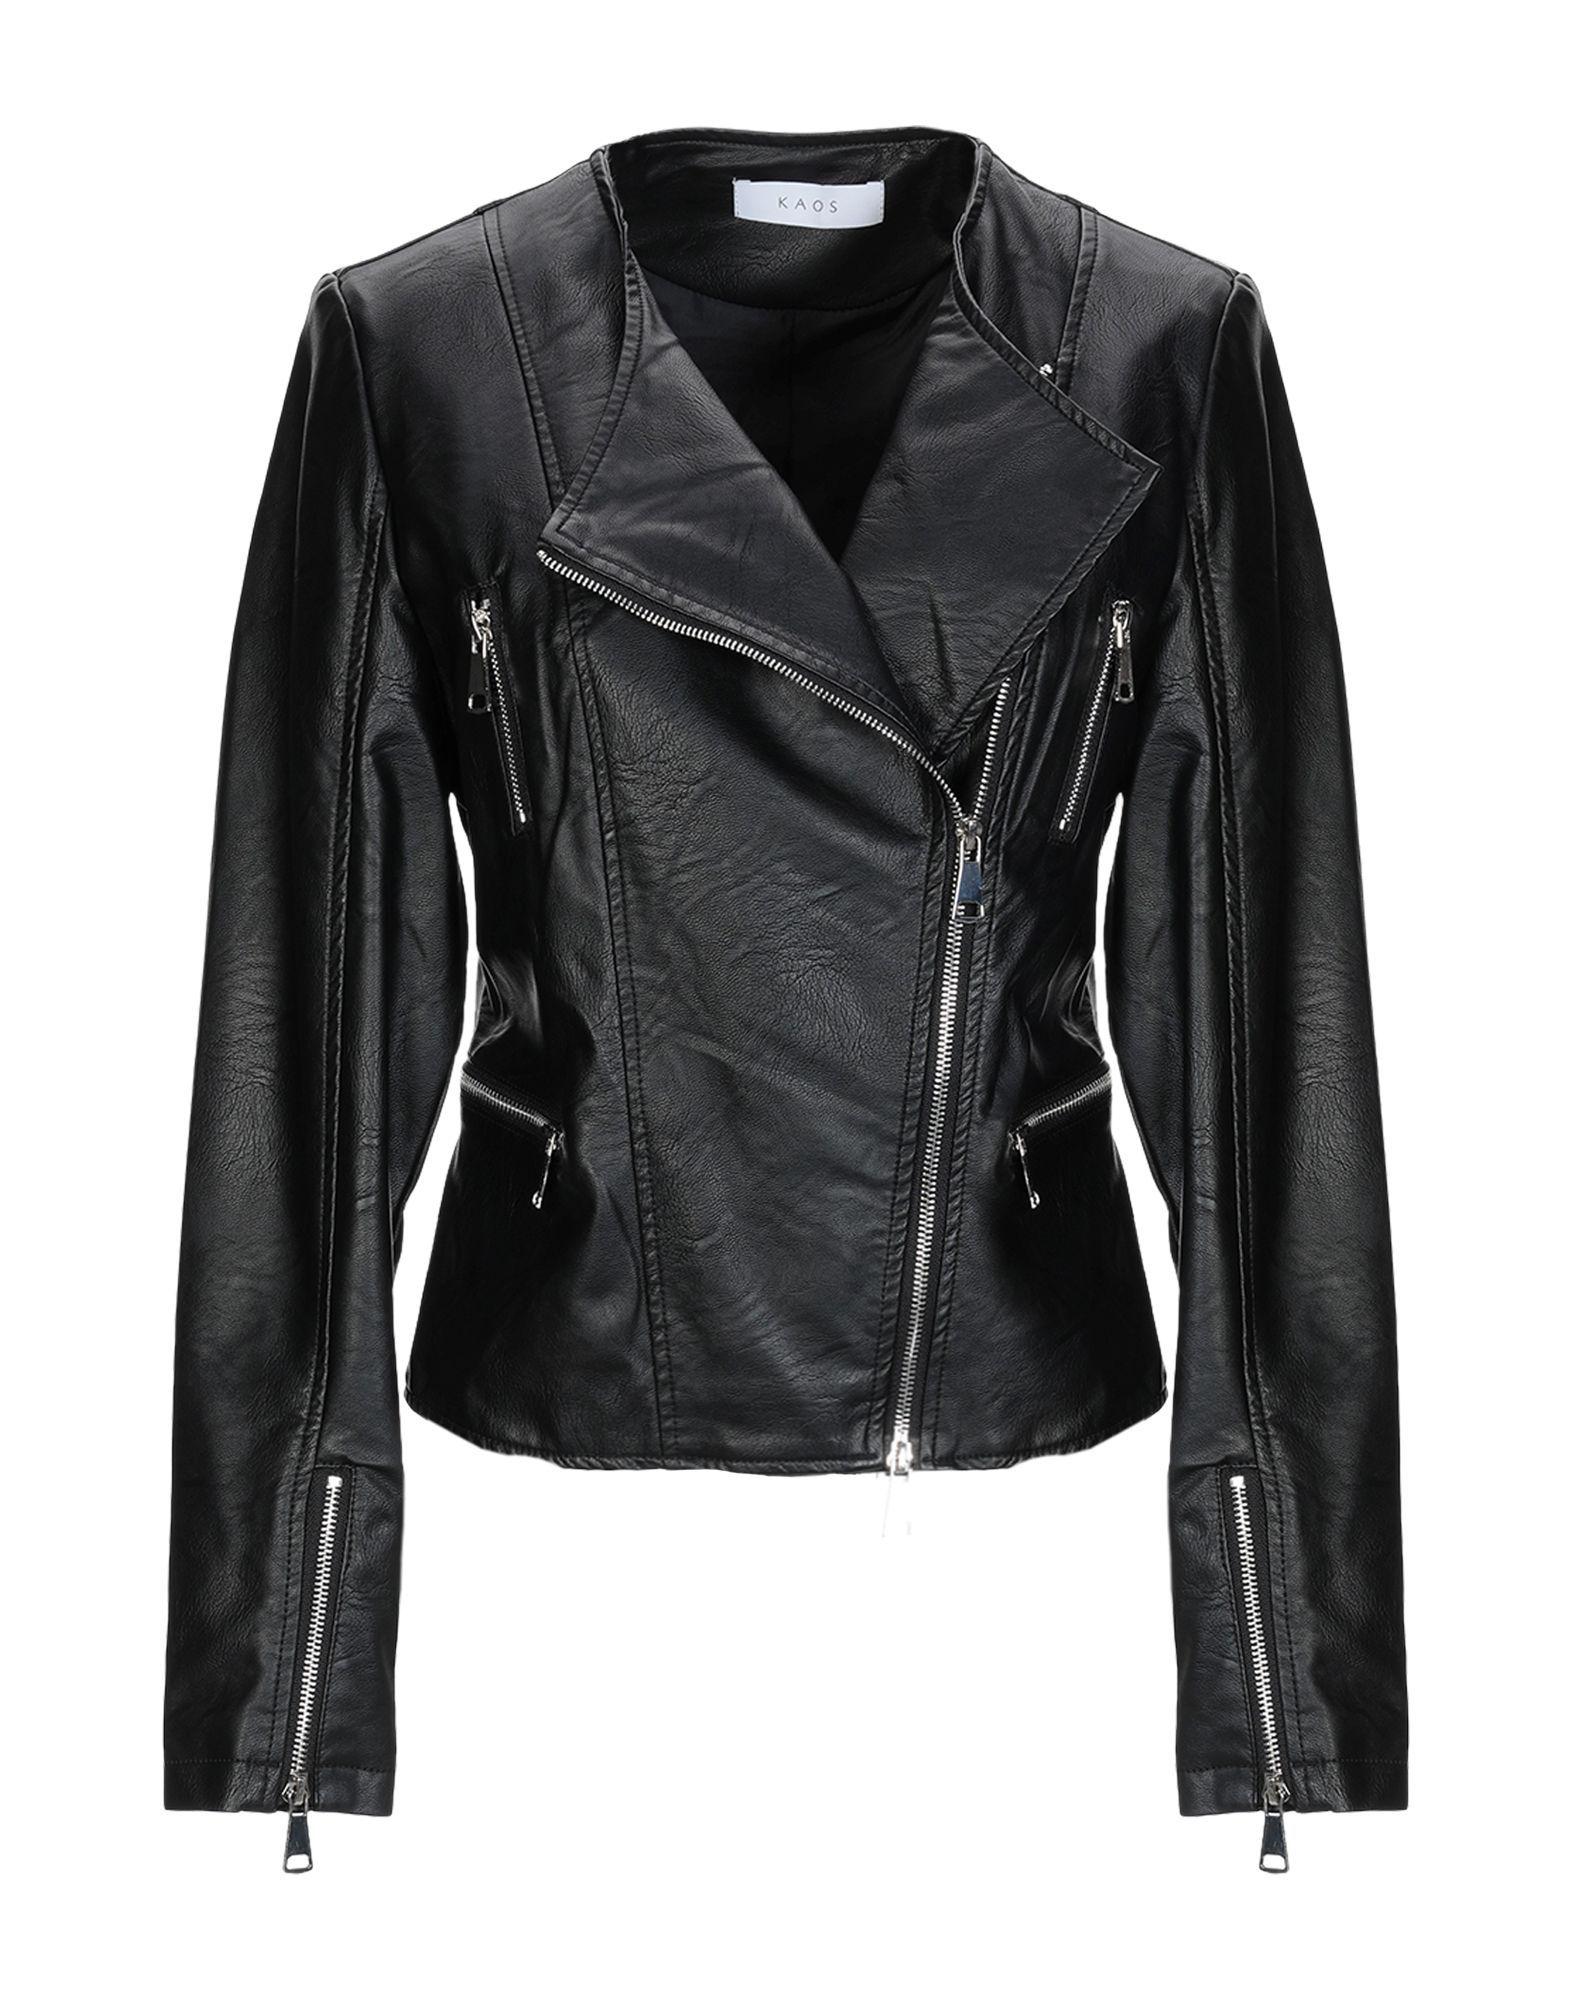 Kaos Black Faux Leather Jacket